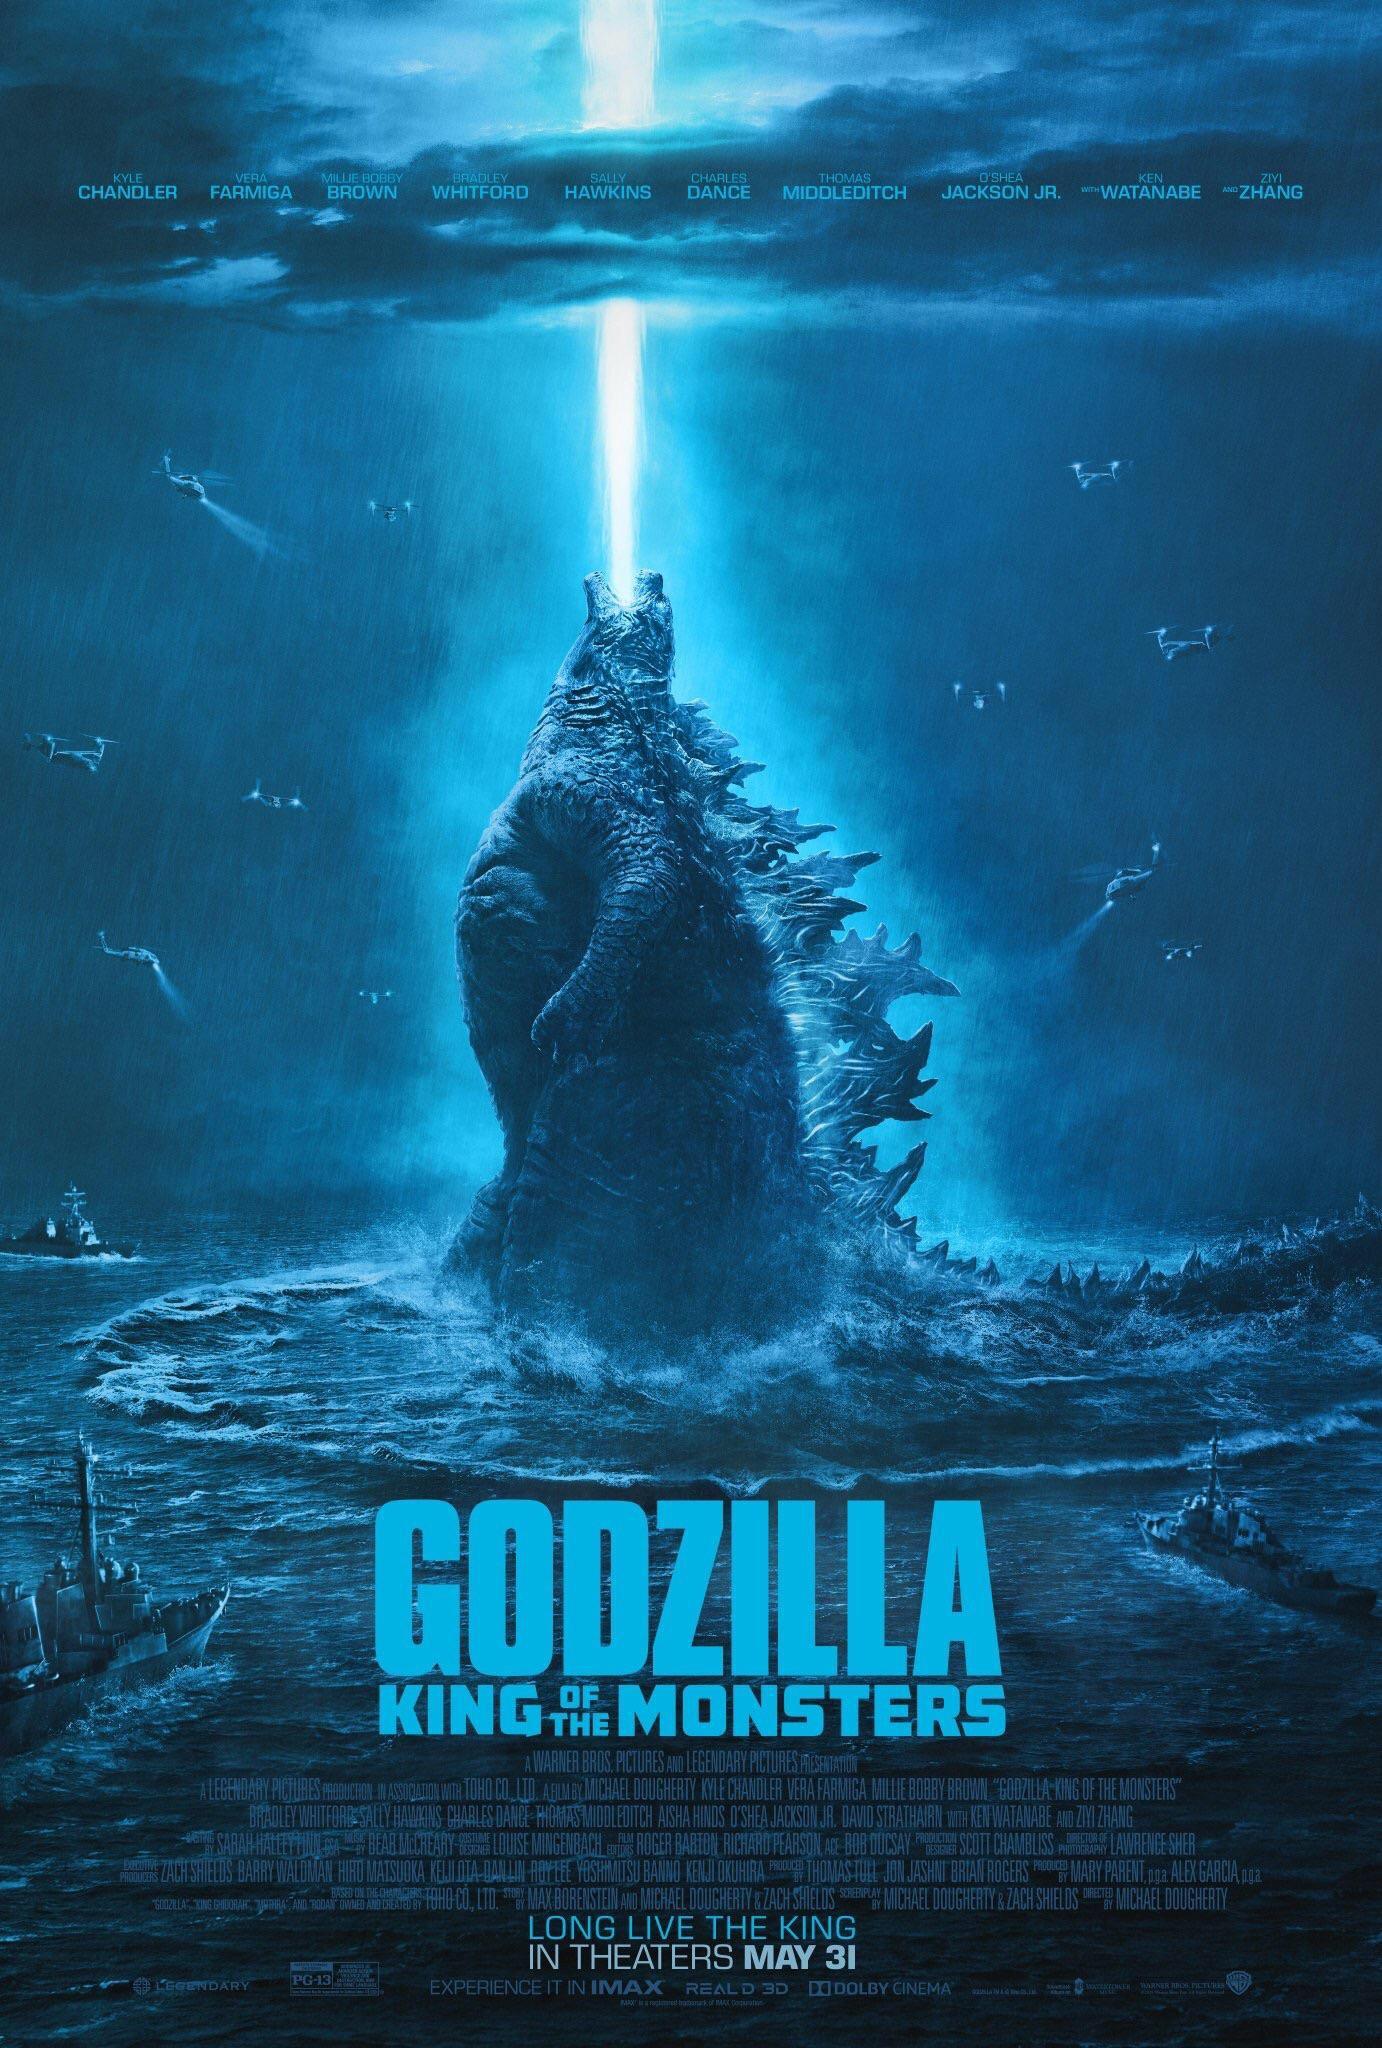 Godzilla-king-monsters-3d-3-D-movie-poster.JPG